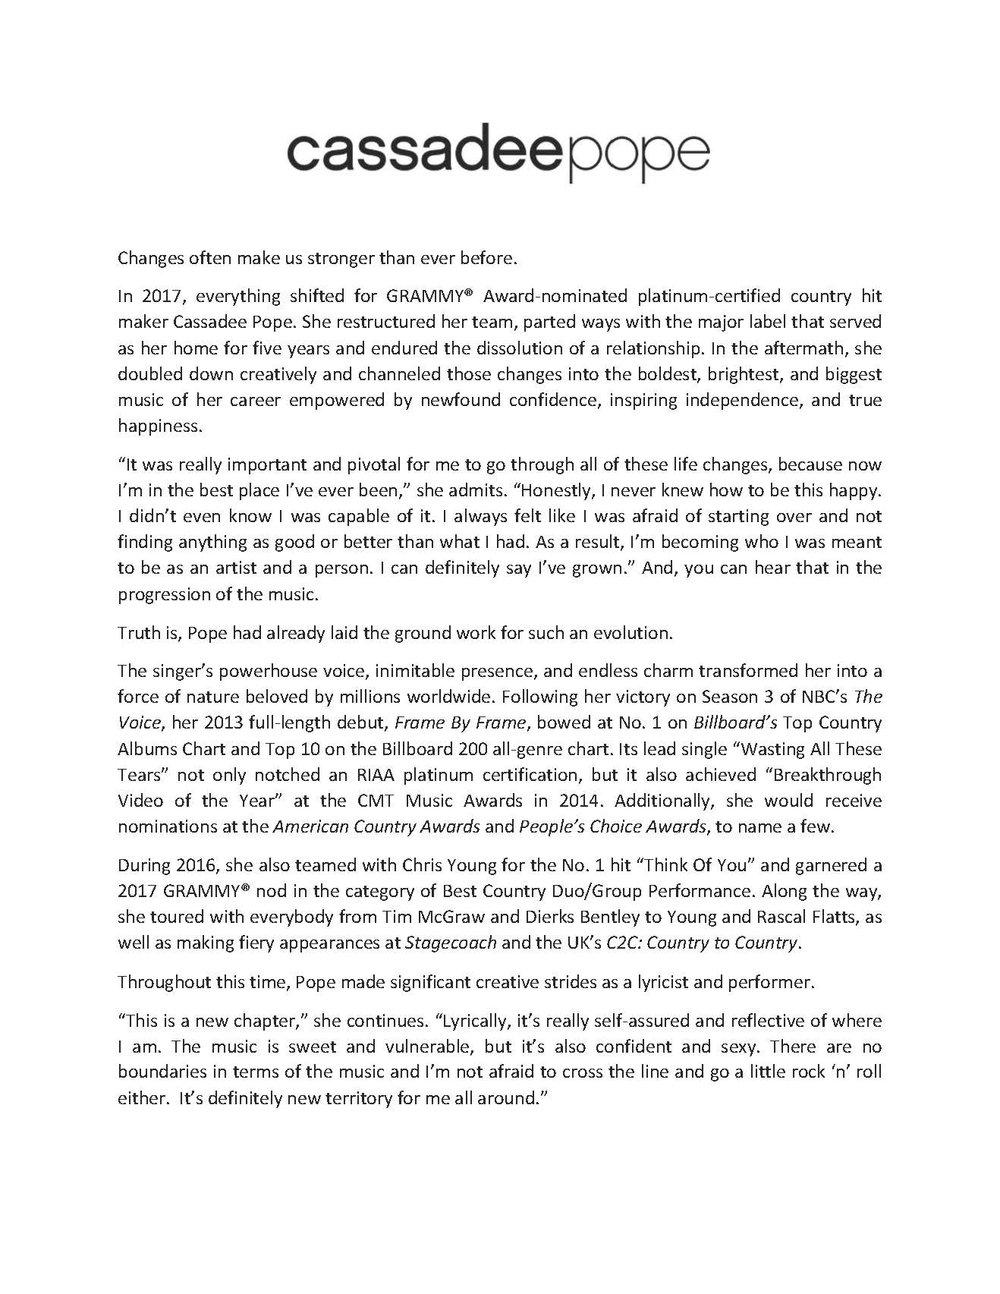 Cassadee Pope 2018 Bio[10]_Page_1.jpg